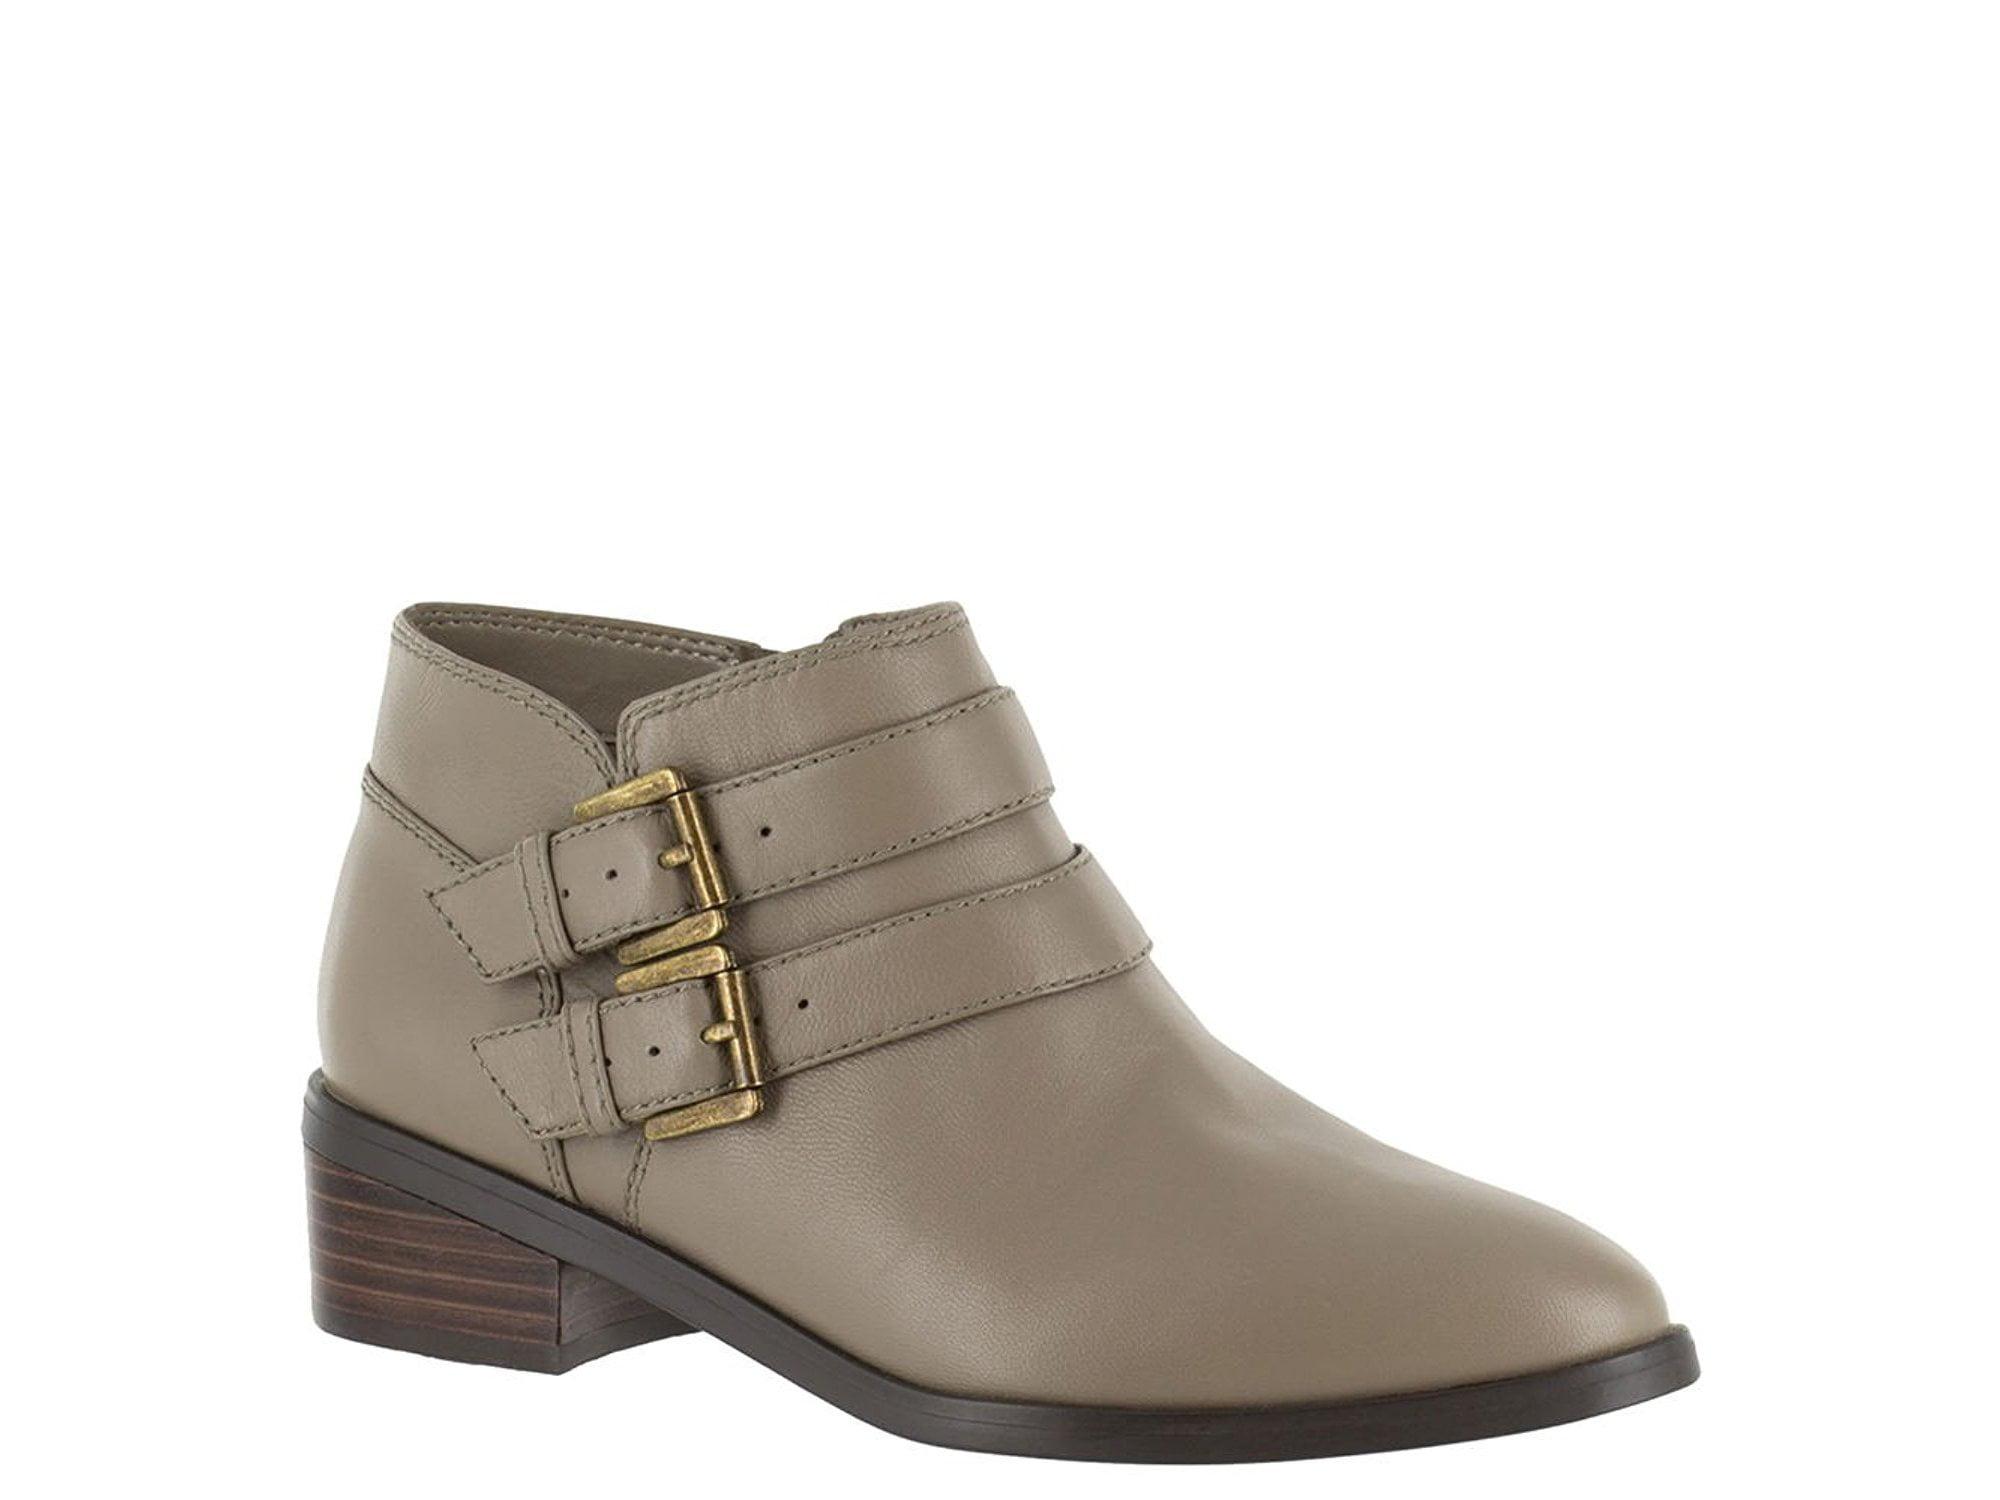 Bella Vita Womens Frankie Leather Closed Toe Ankle Fashion Boots